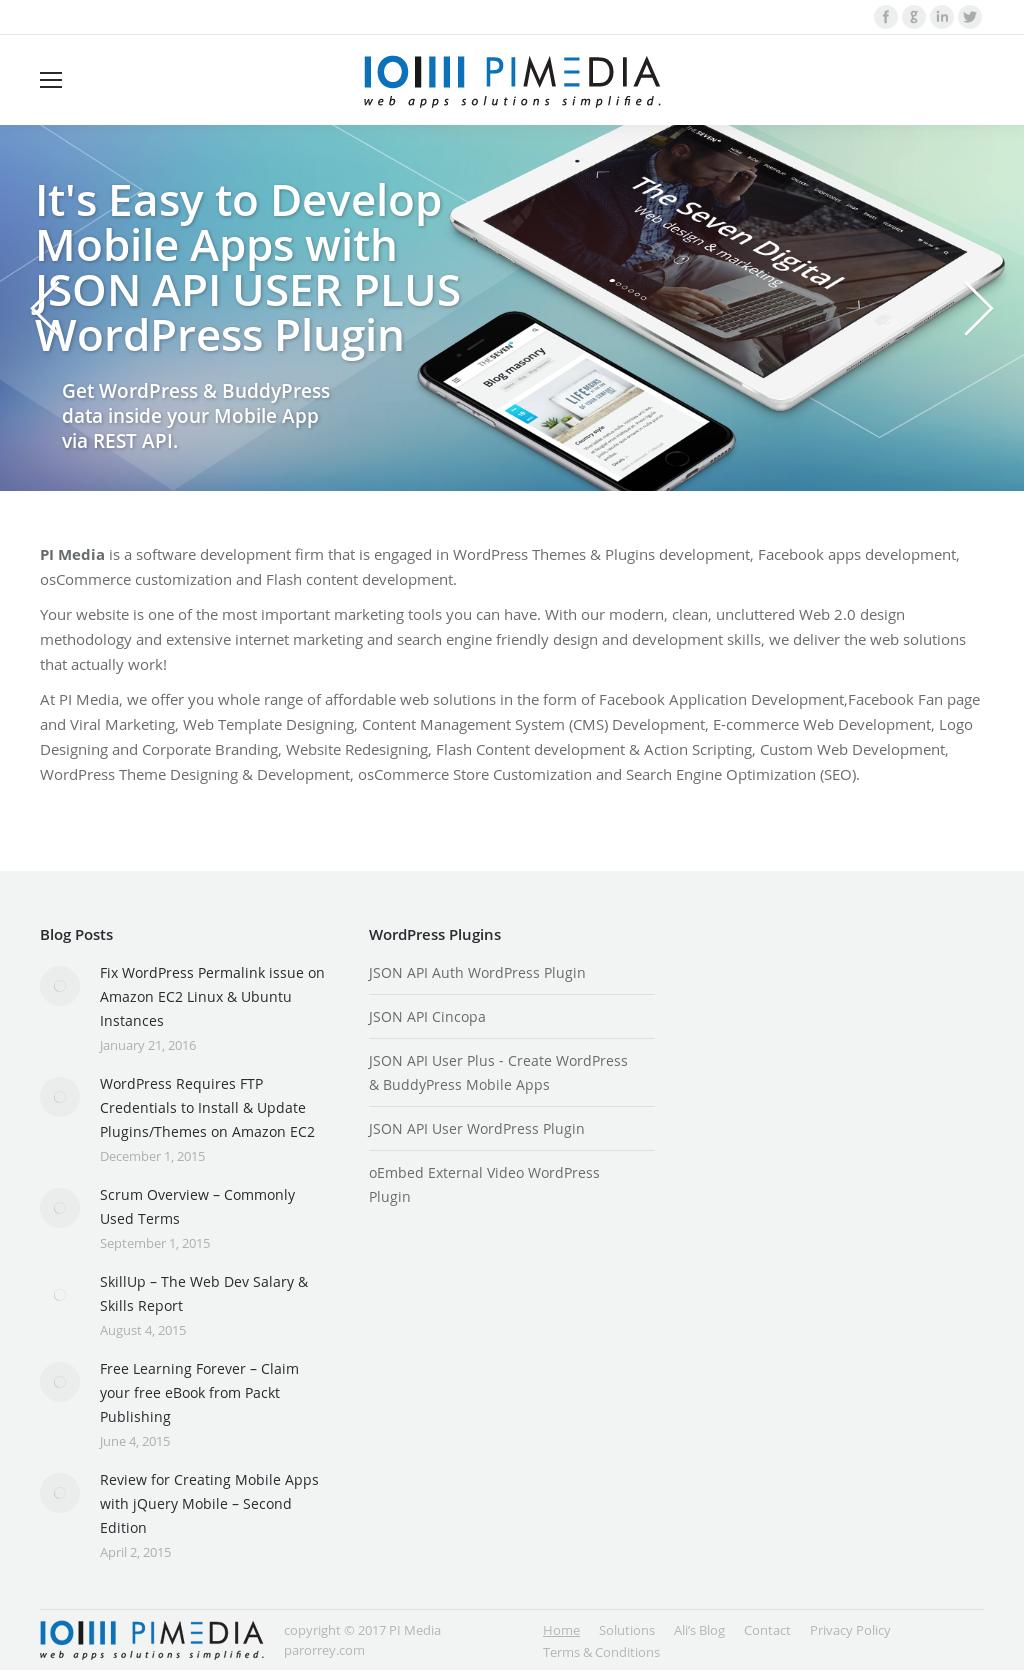 Pi Media Competitors, Revenue and Employees - Owler Company Profile